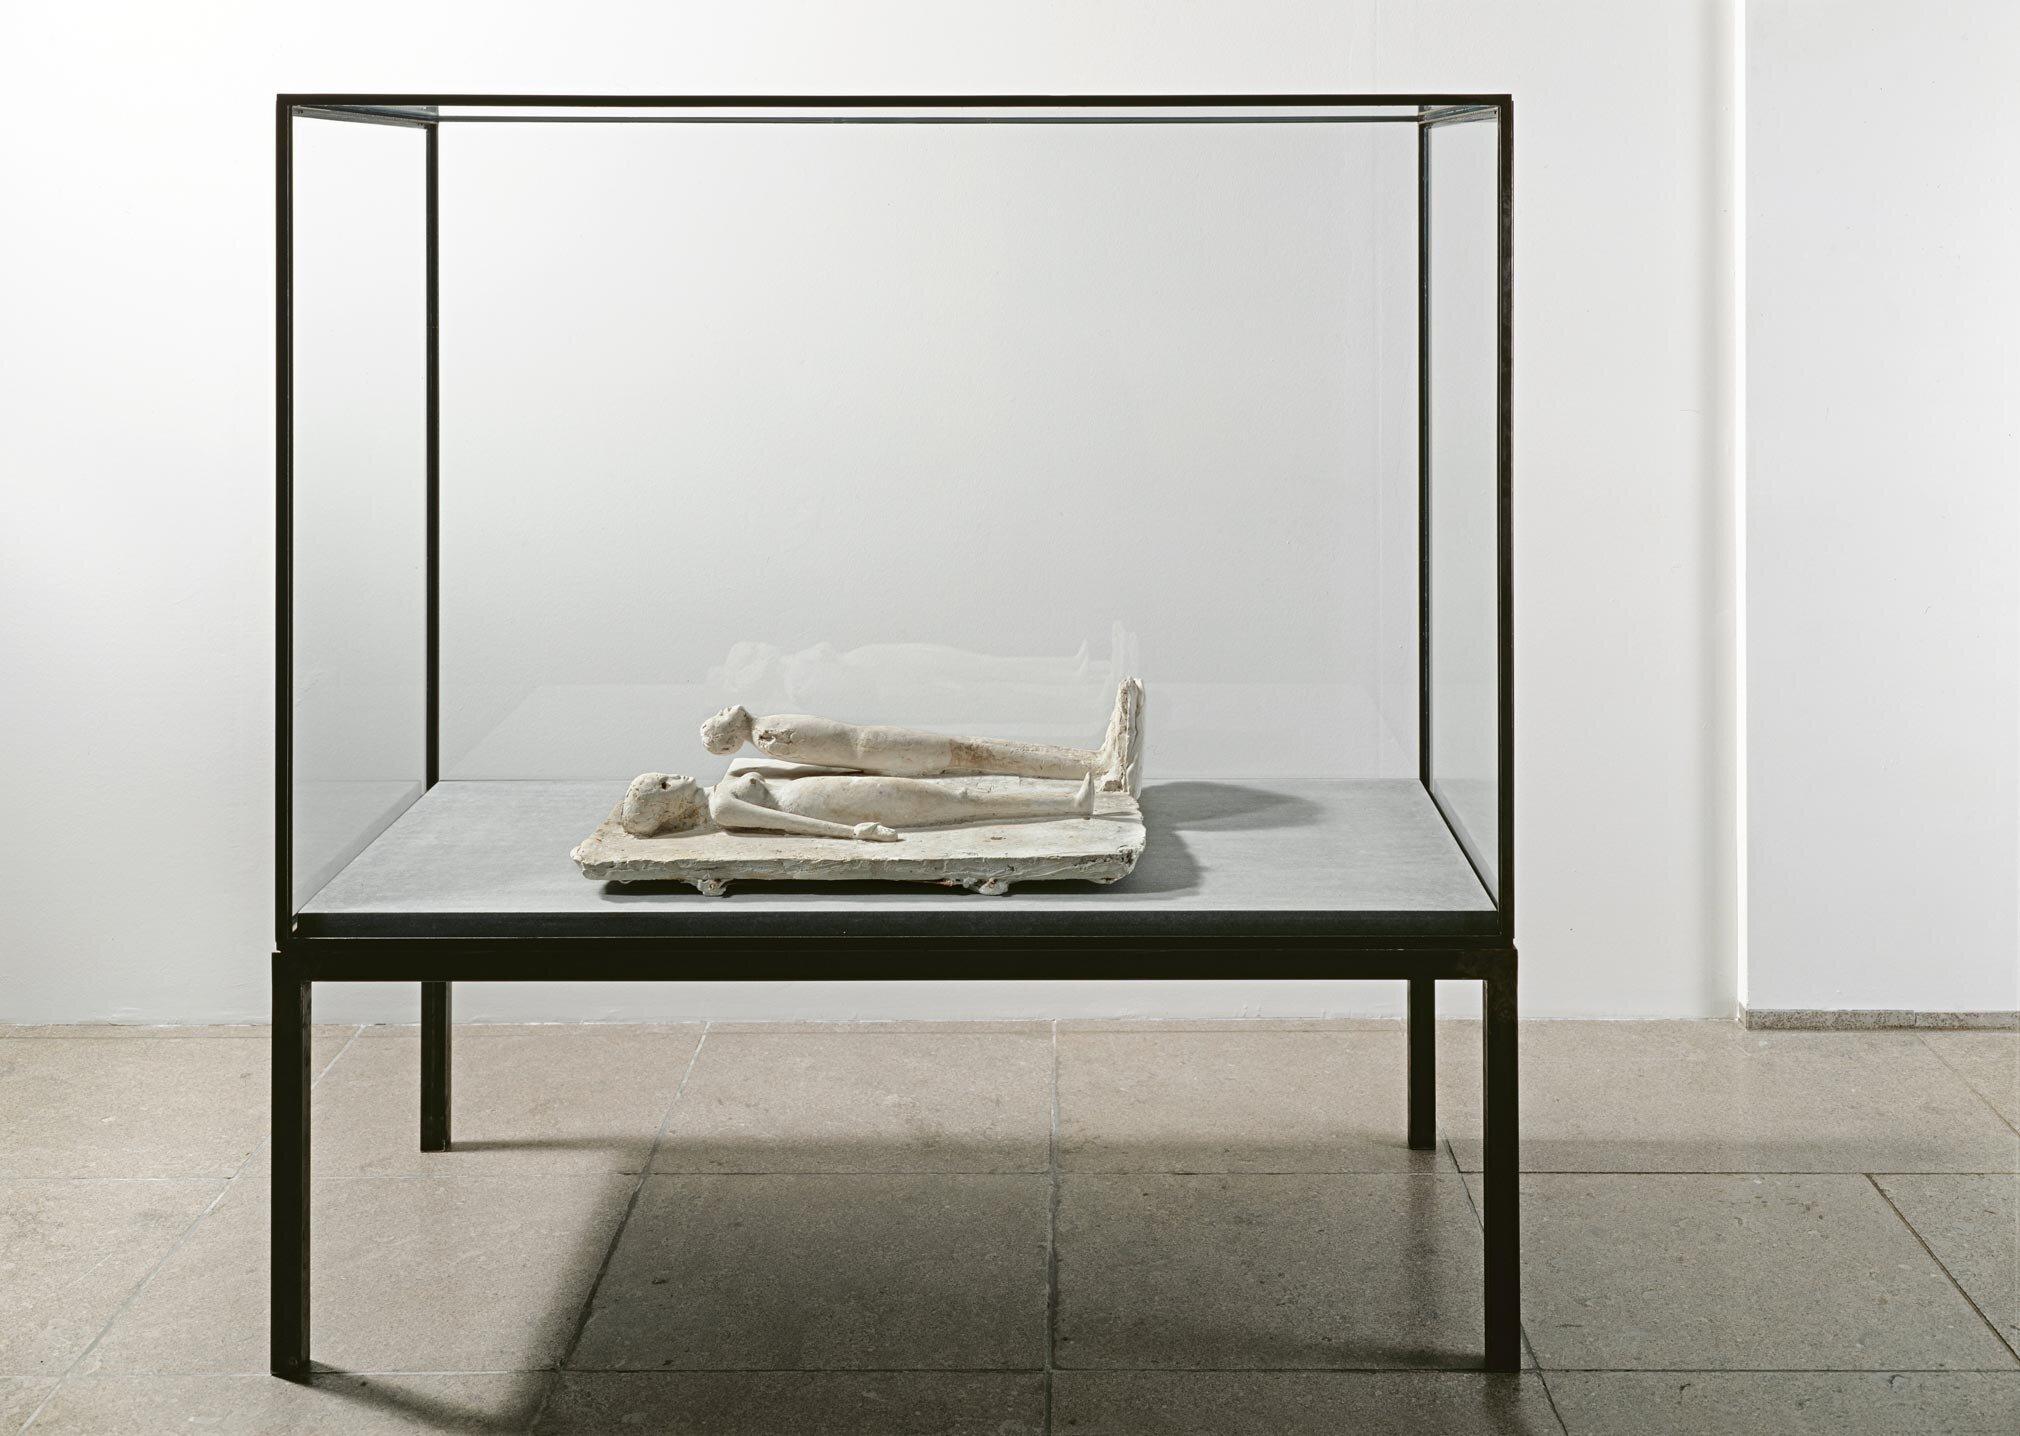 LE-MILE-Magazine-written-Tgen-Donovan-BASTIAN-Gallery-London-Joseph-Beuys,-The-Couple,-1952-953.jpg